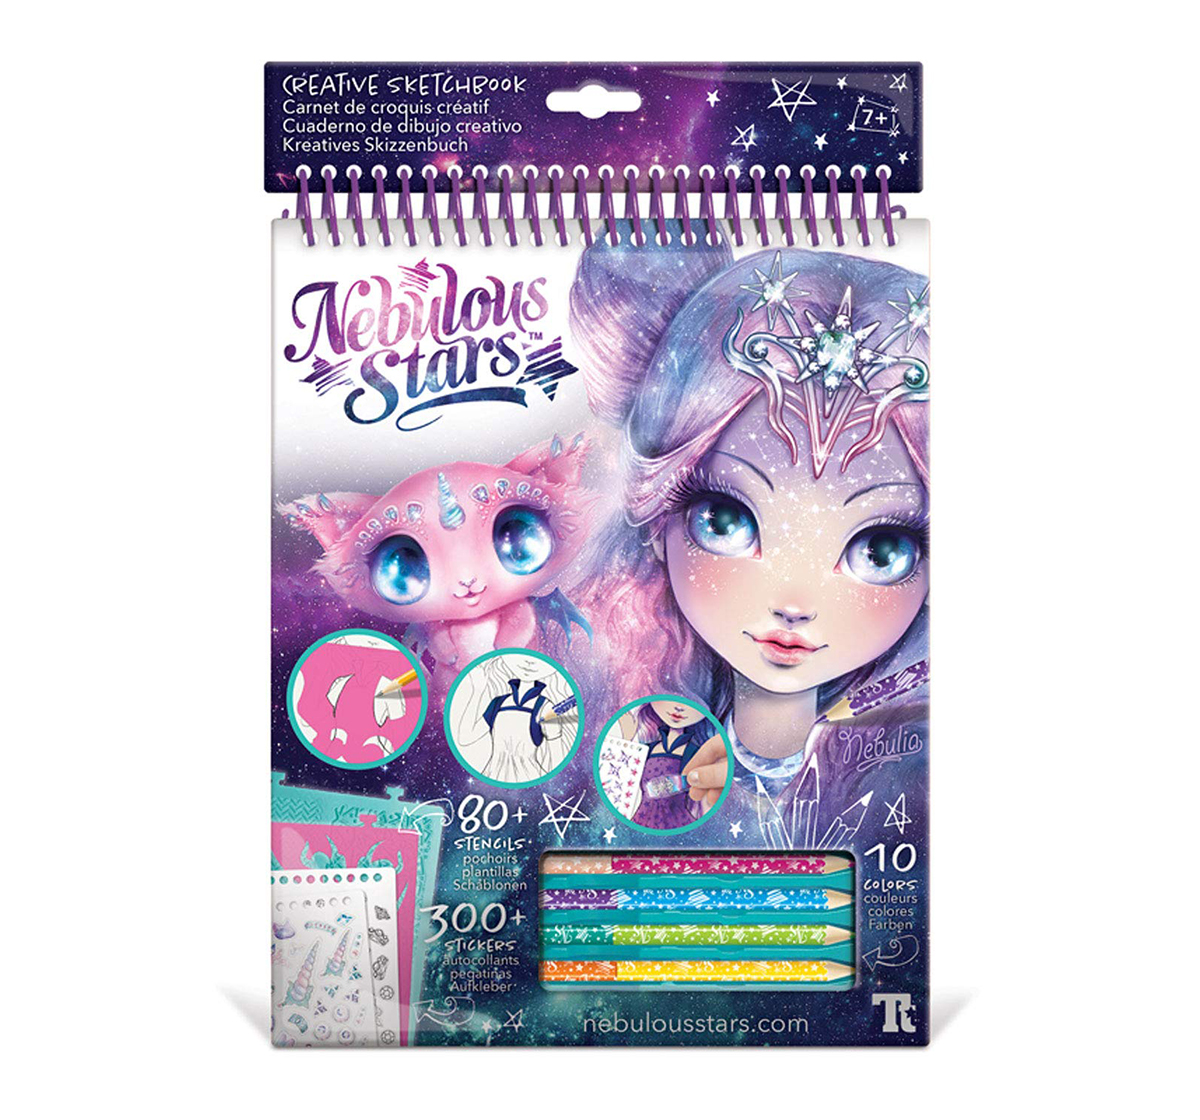 Nebulous Star   Nebulous Star - Creative Sketchbook - Nebulia DIY Art & Craft Kits for Girls age 7Y+